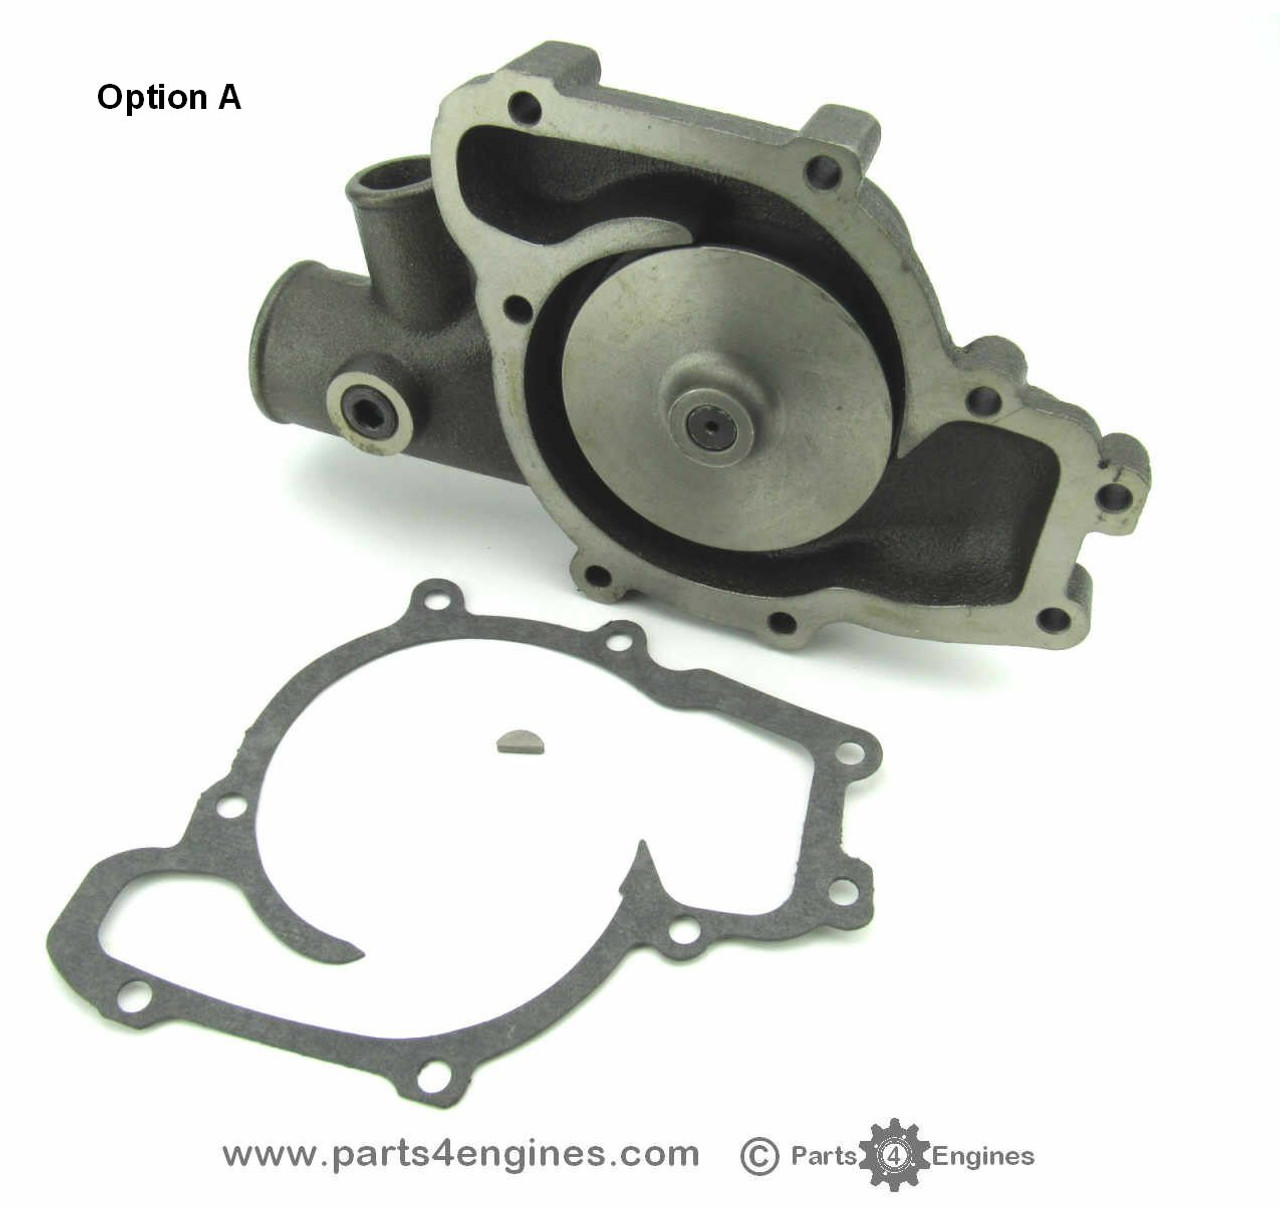 Perkins 6.354 water pump (option A  rear view) - parts4engines.com